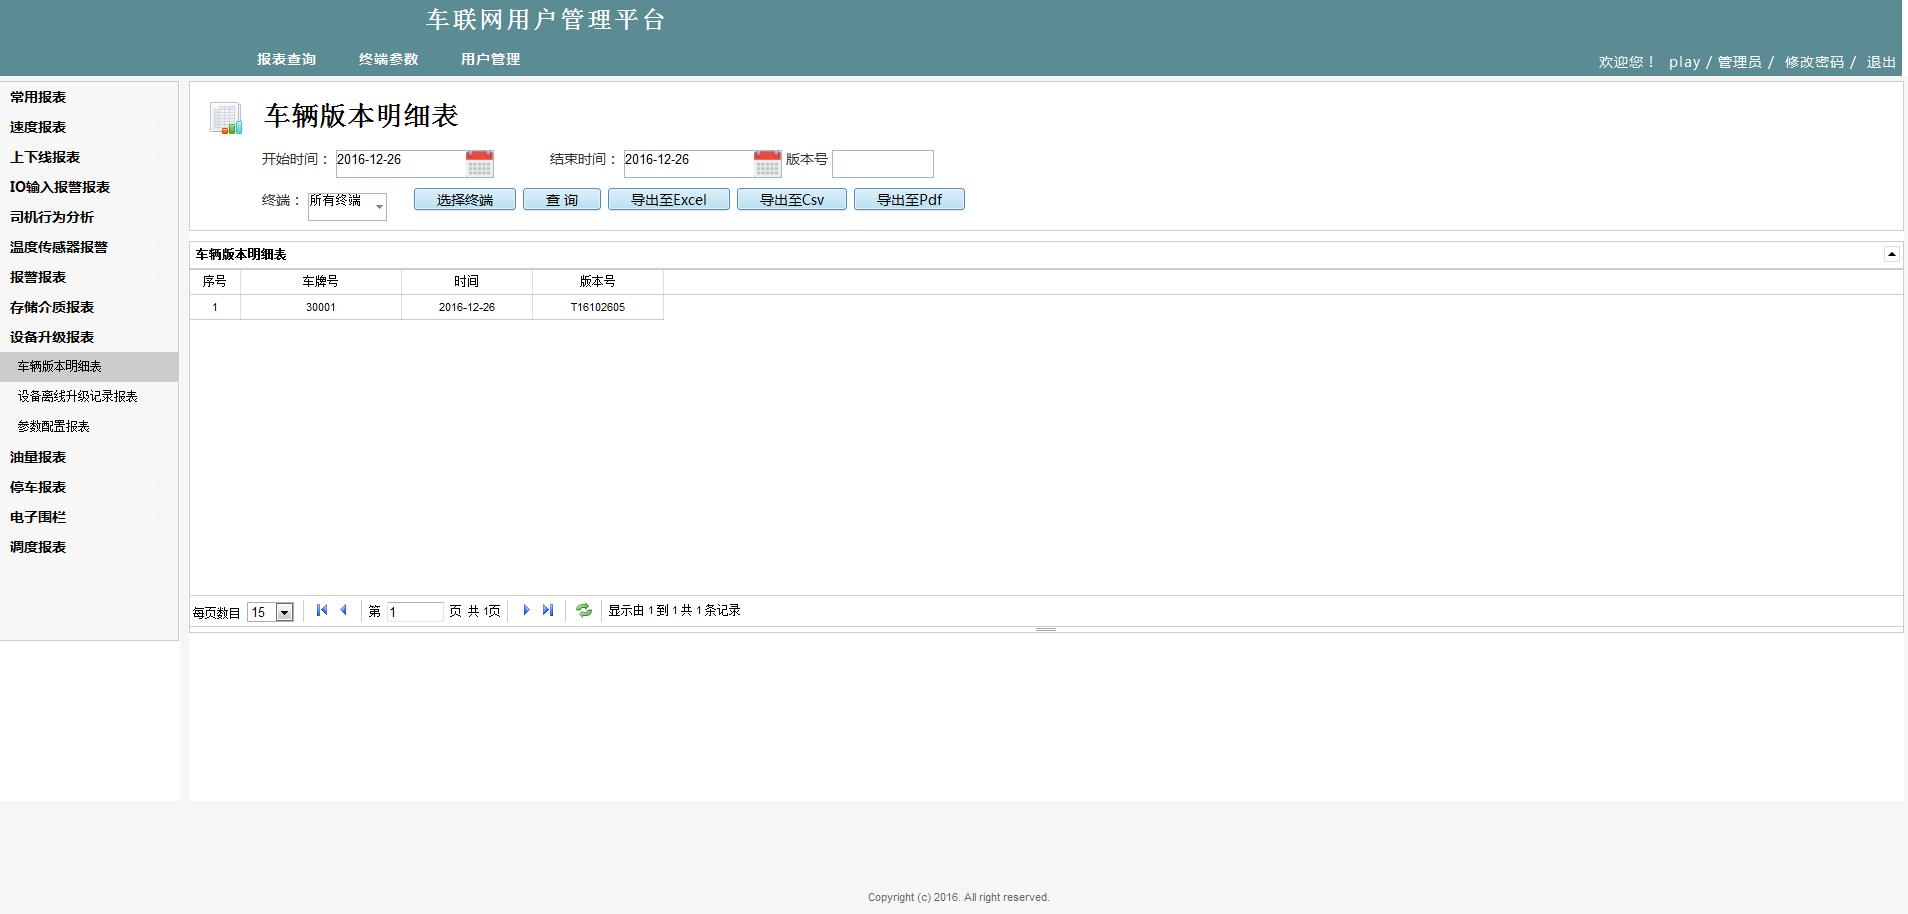 IVMS WEB客户端——智能车辆管理系统平台 第9张